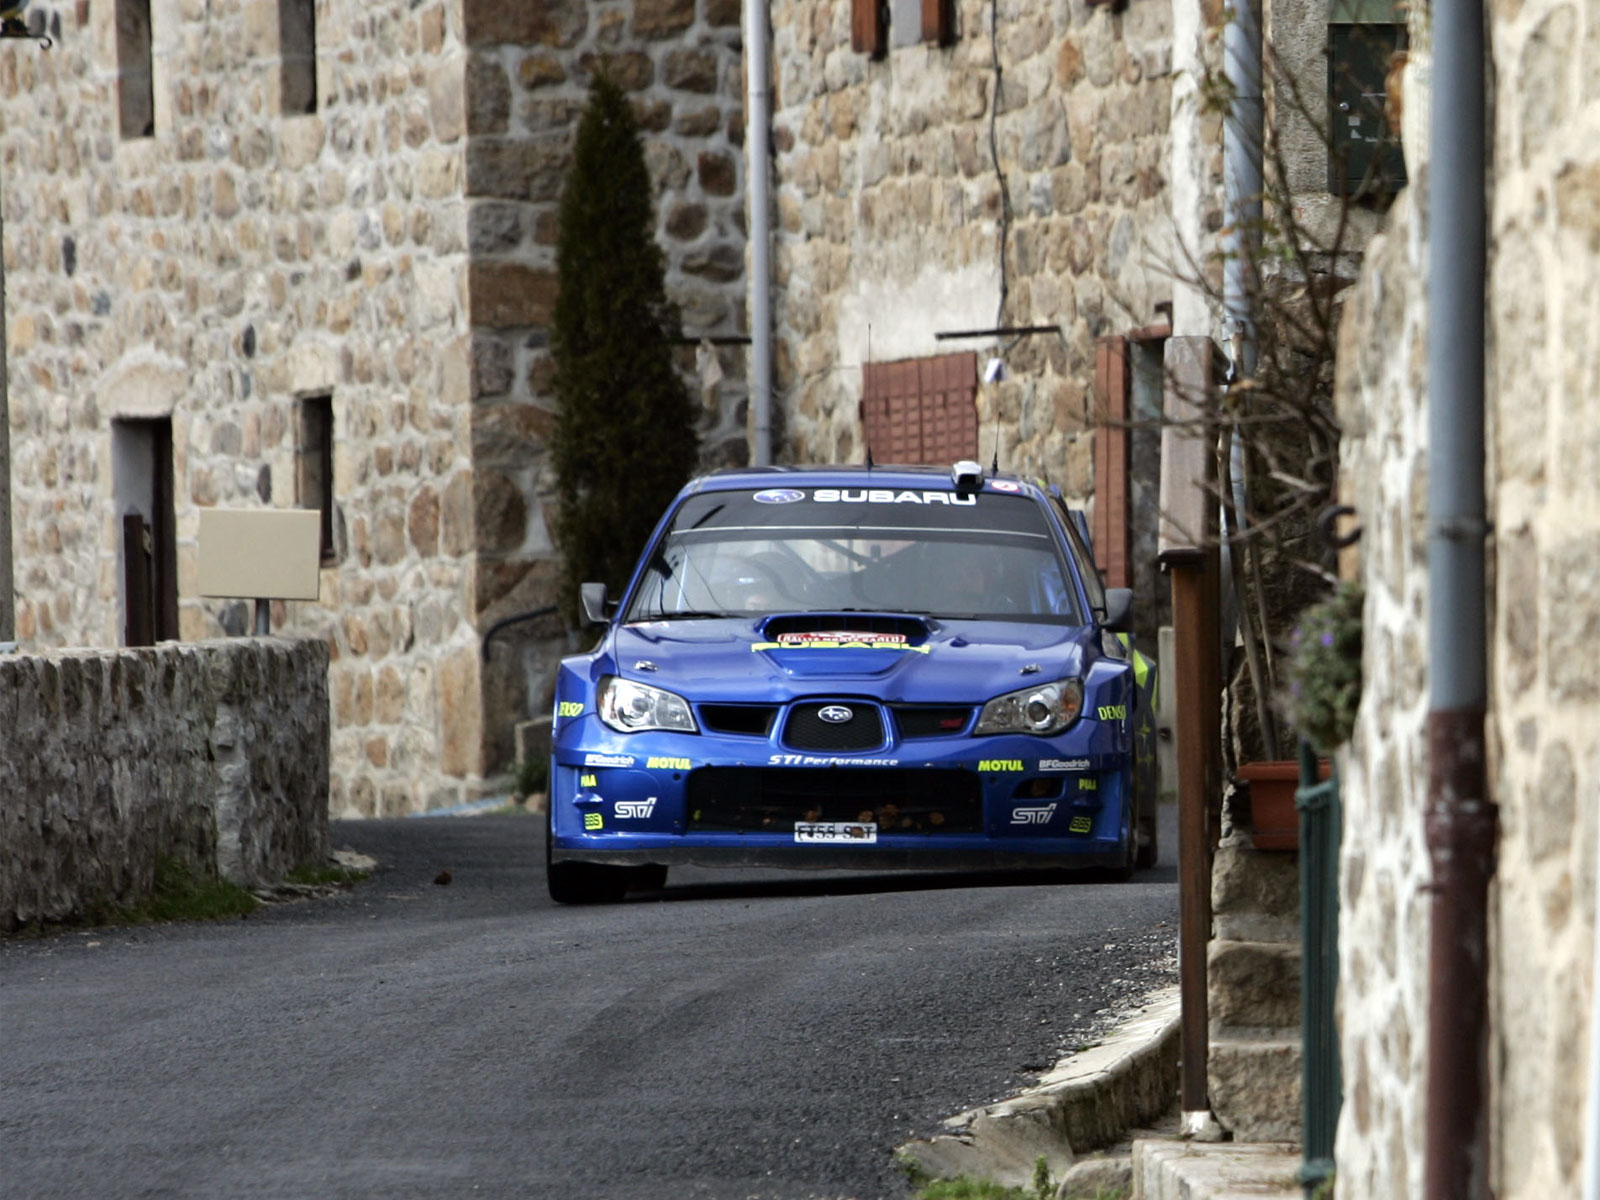 2007 Subaru Impreza Wrc2006 Image